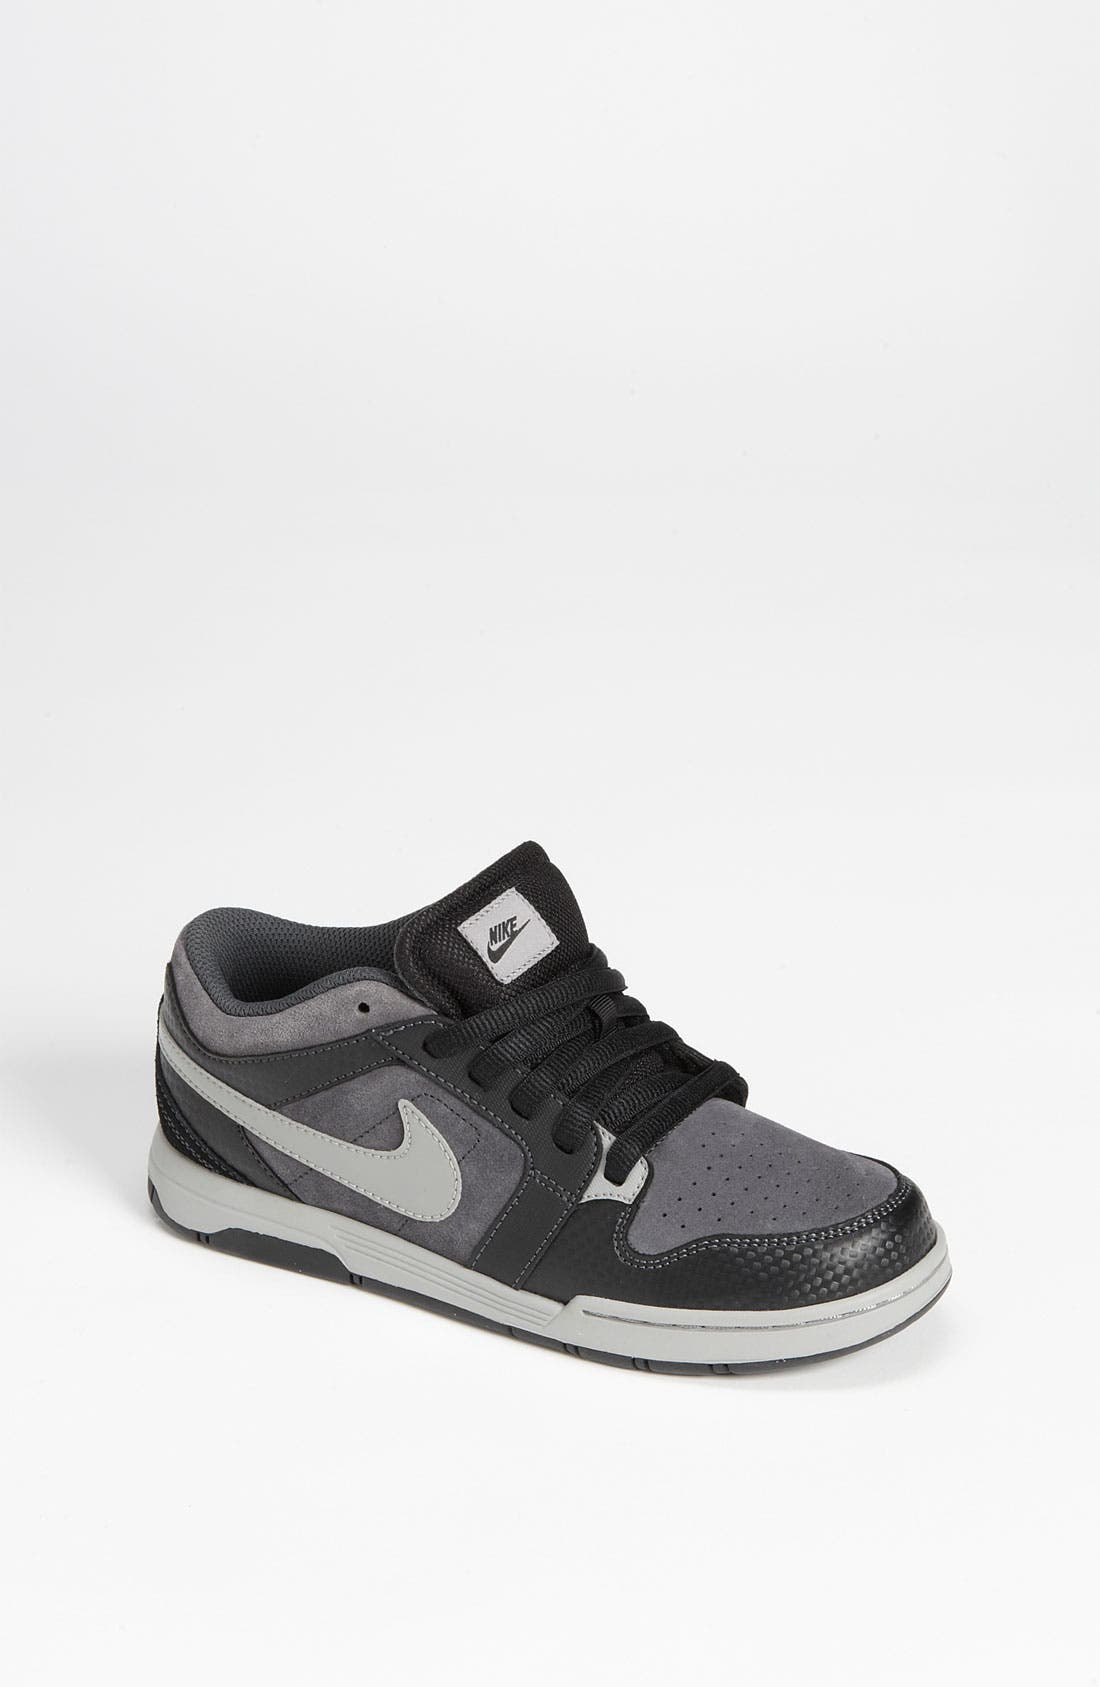 Alternate Image 1 Selected - Nike 'Mogan 3' Sneaker (Toddler, Little Kid & Big Kid)